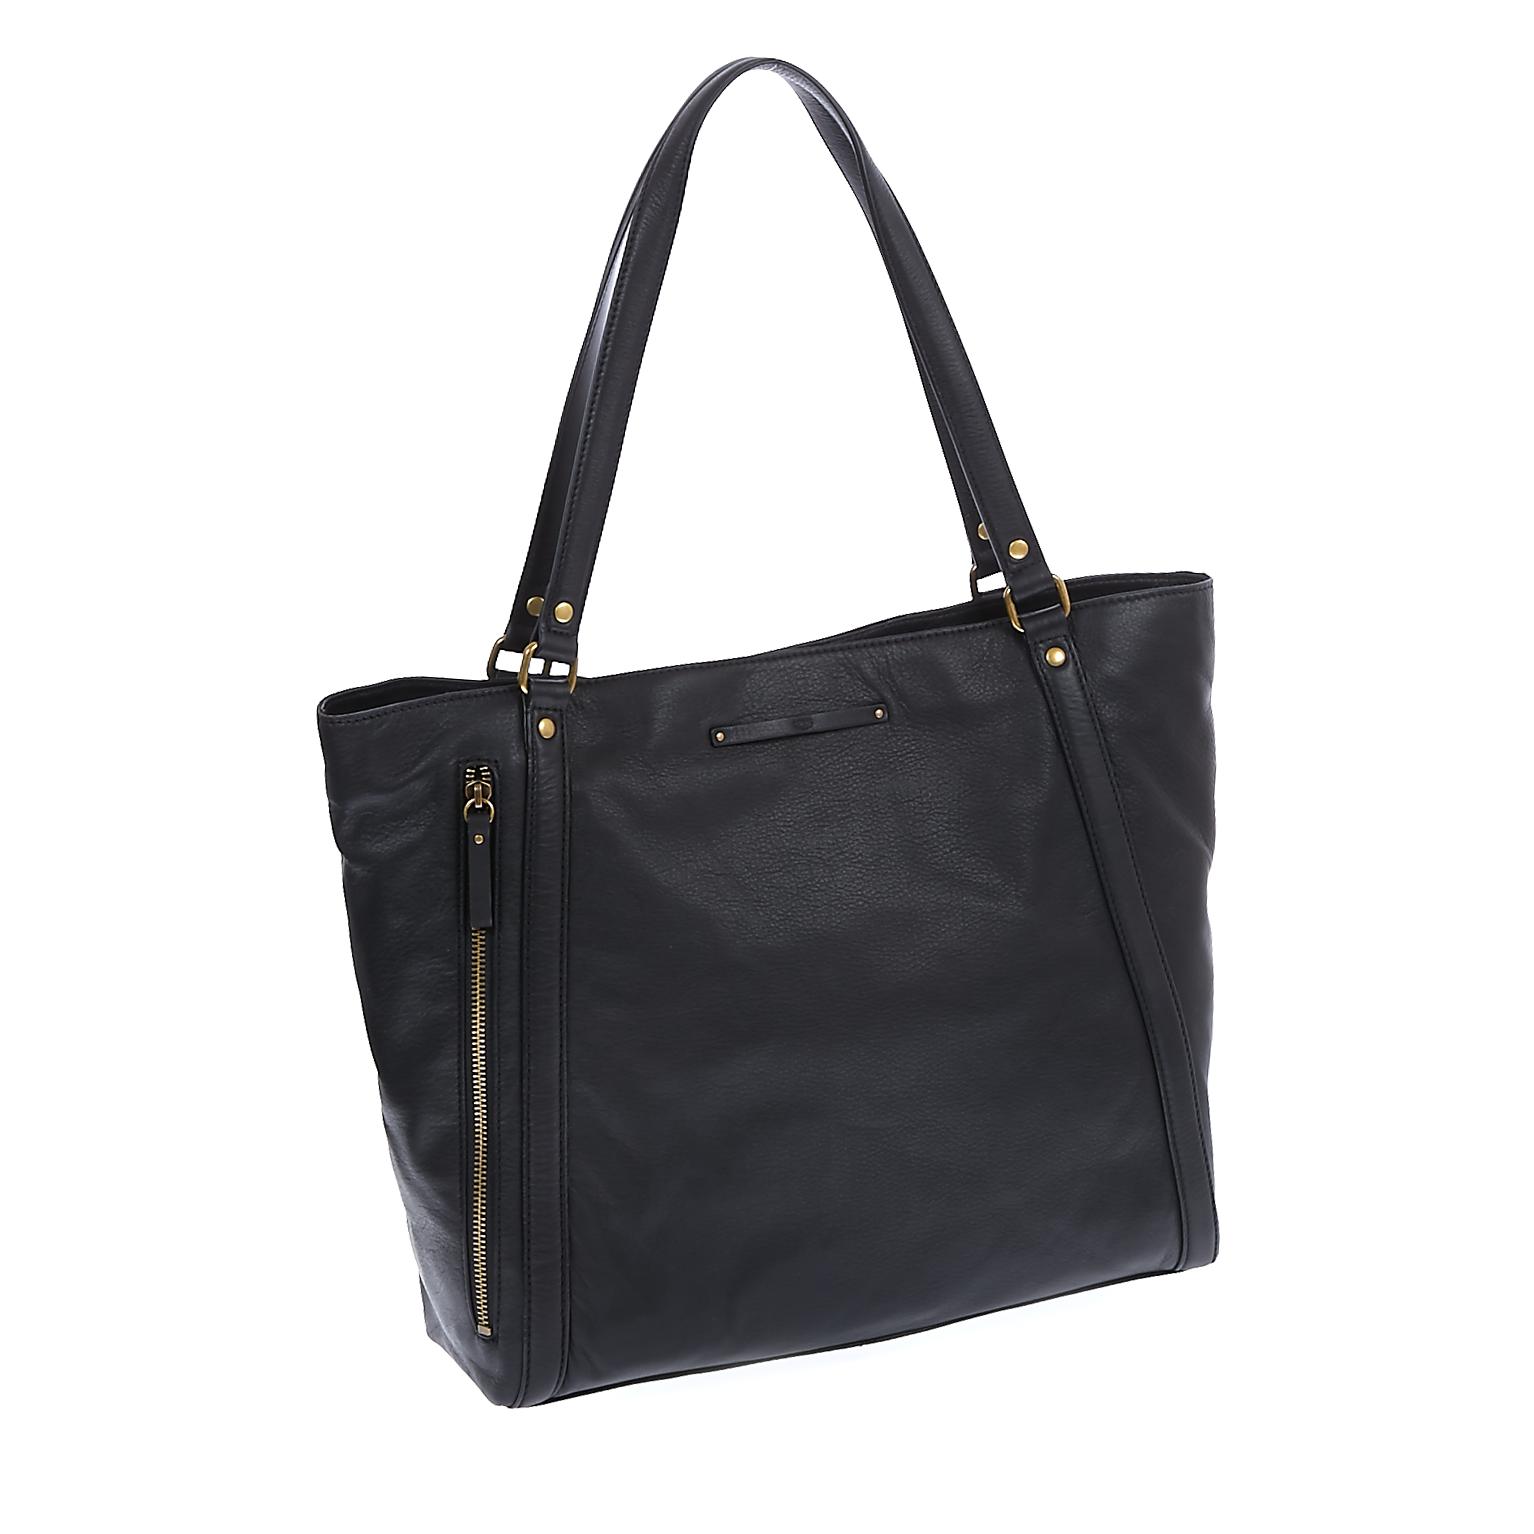 UGG – Γυναικεία τσάντα Ugg Australia μαύρη 1473726.0-0071